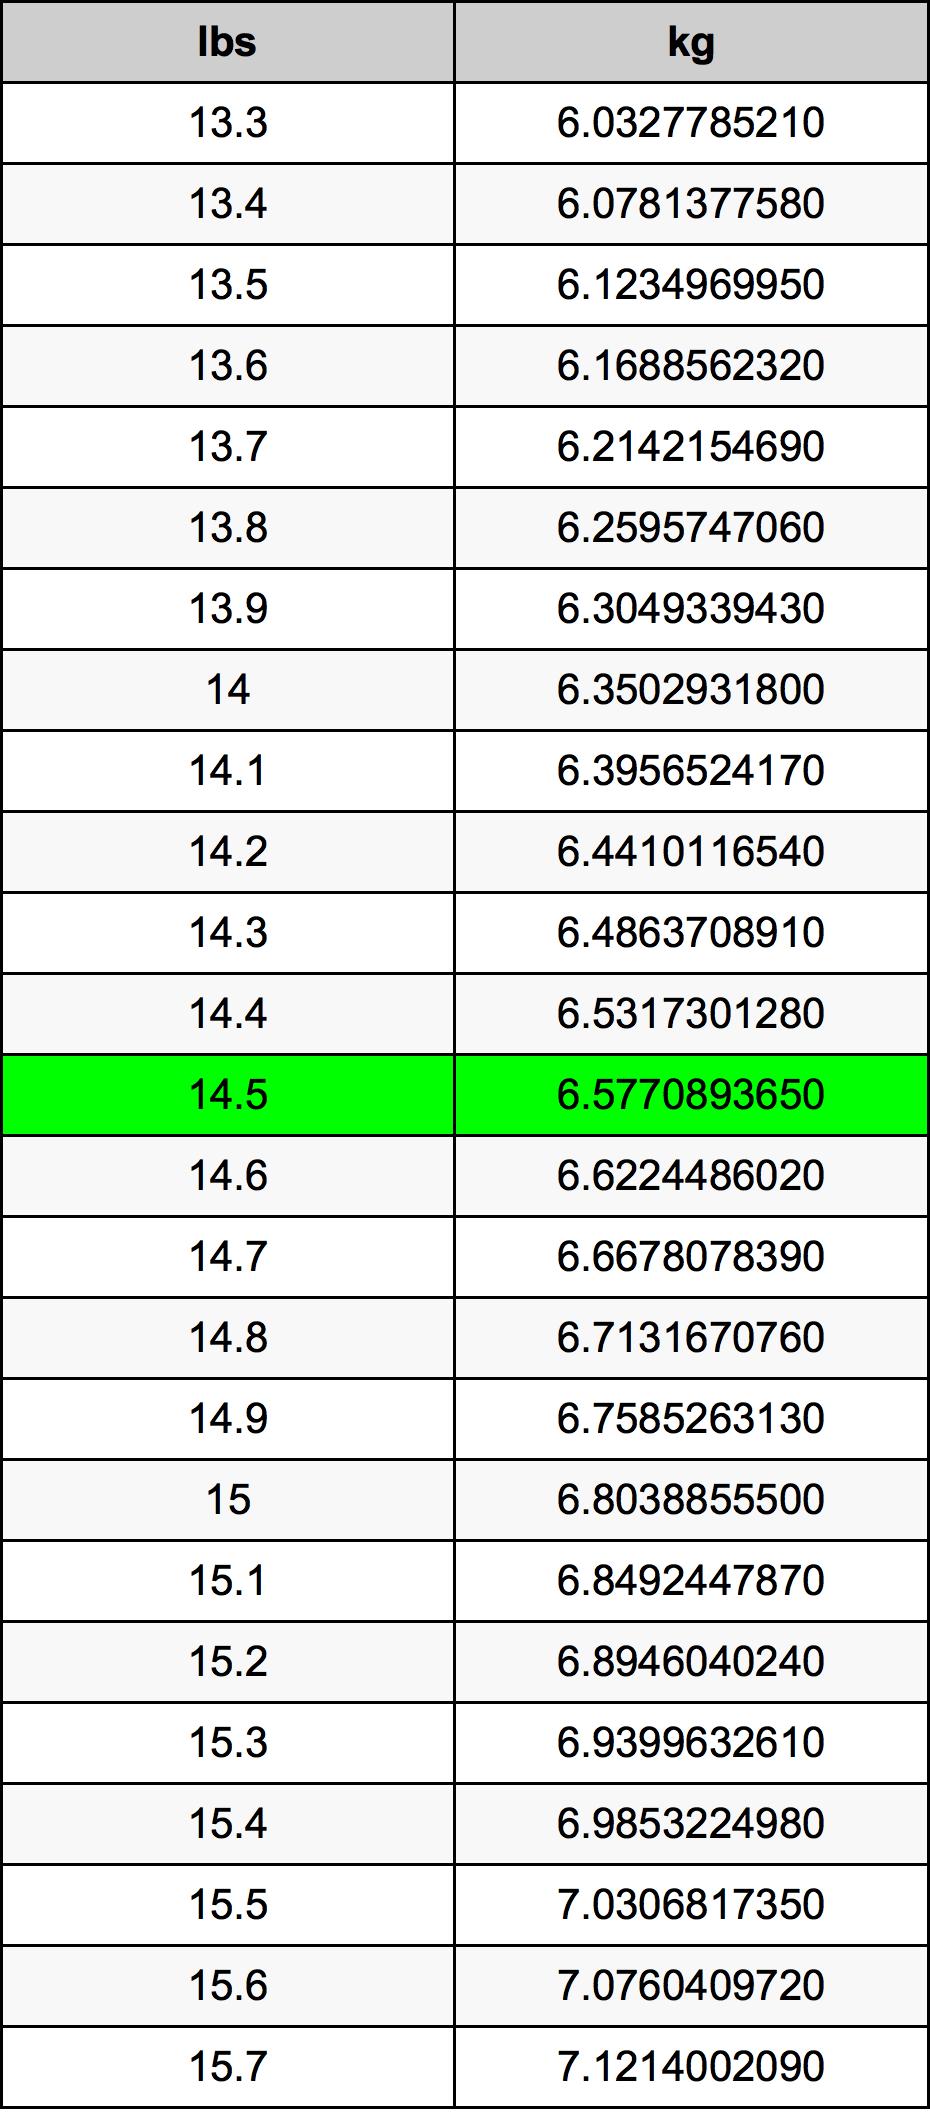 14.5 Libra konverteringstabellen